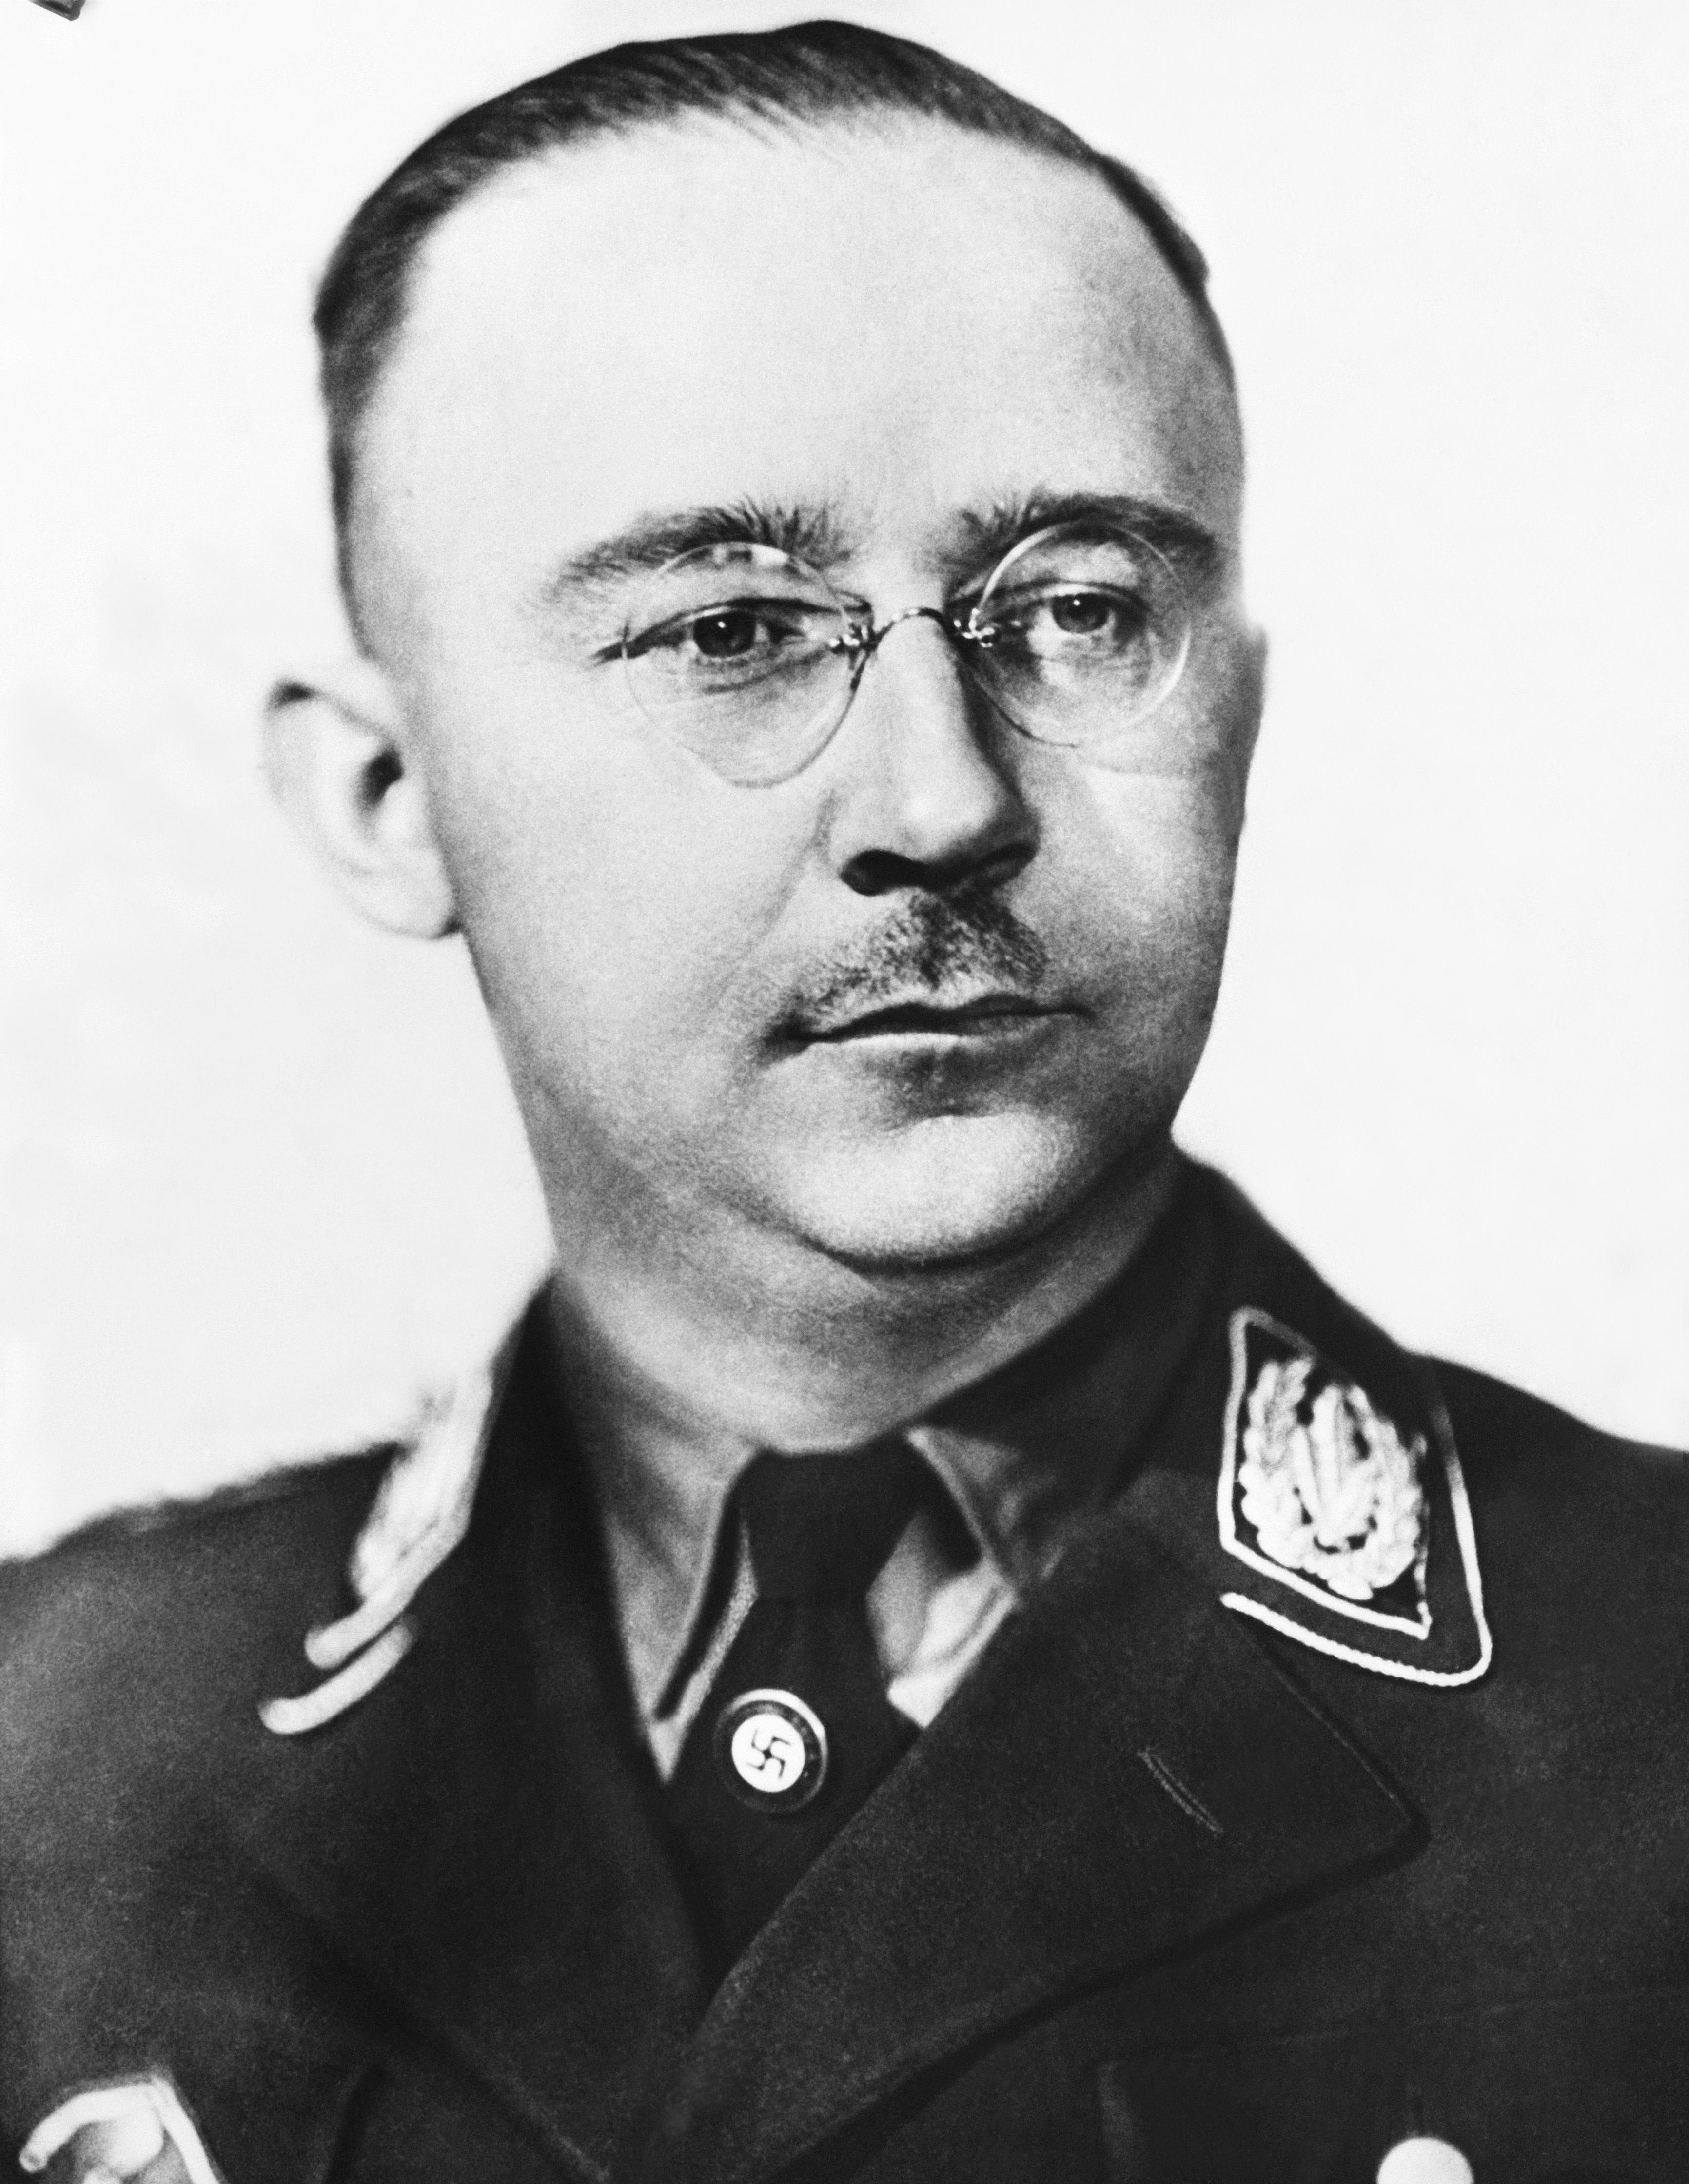 Henrich Himmler poses in Germany in 1945.